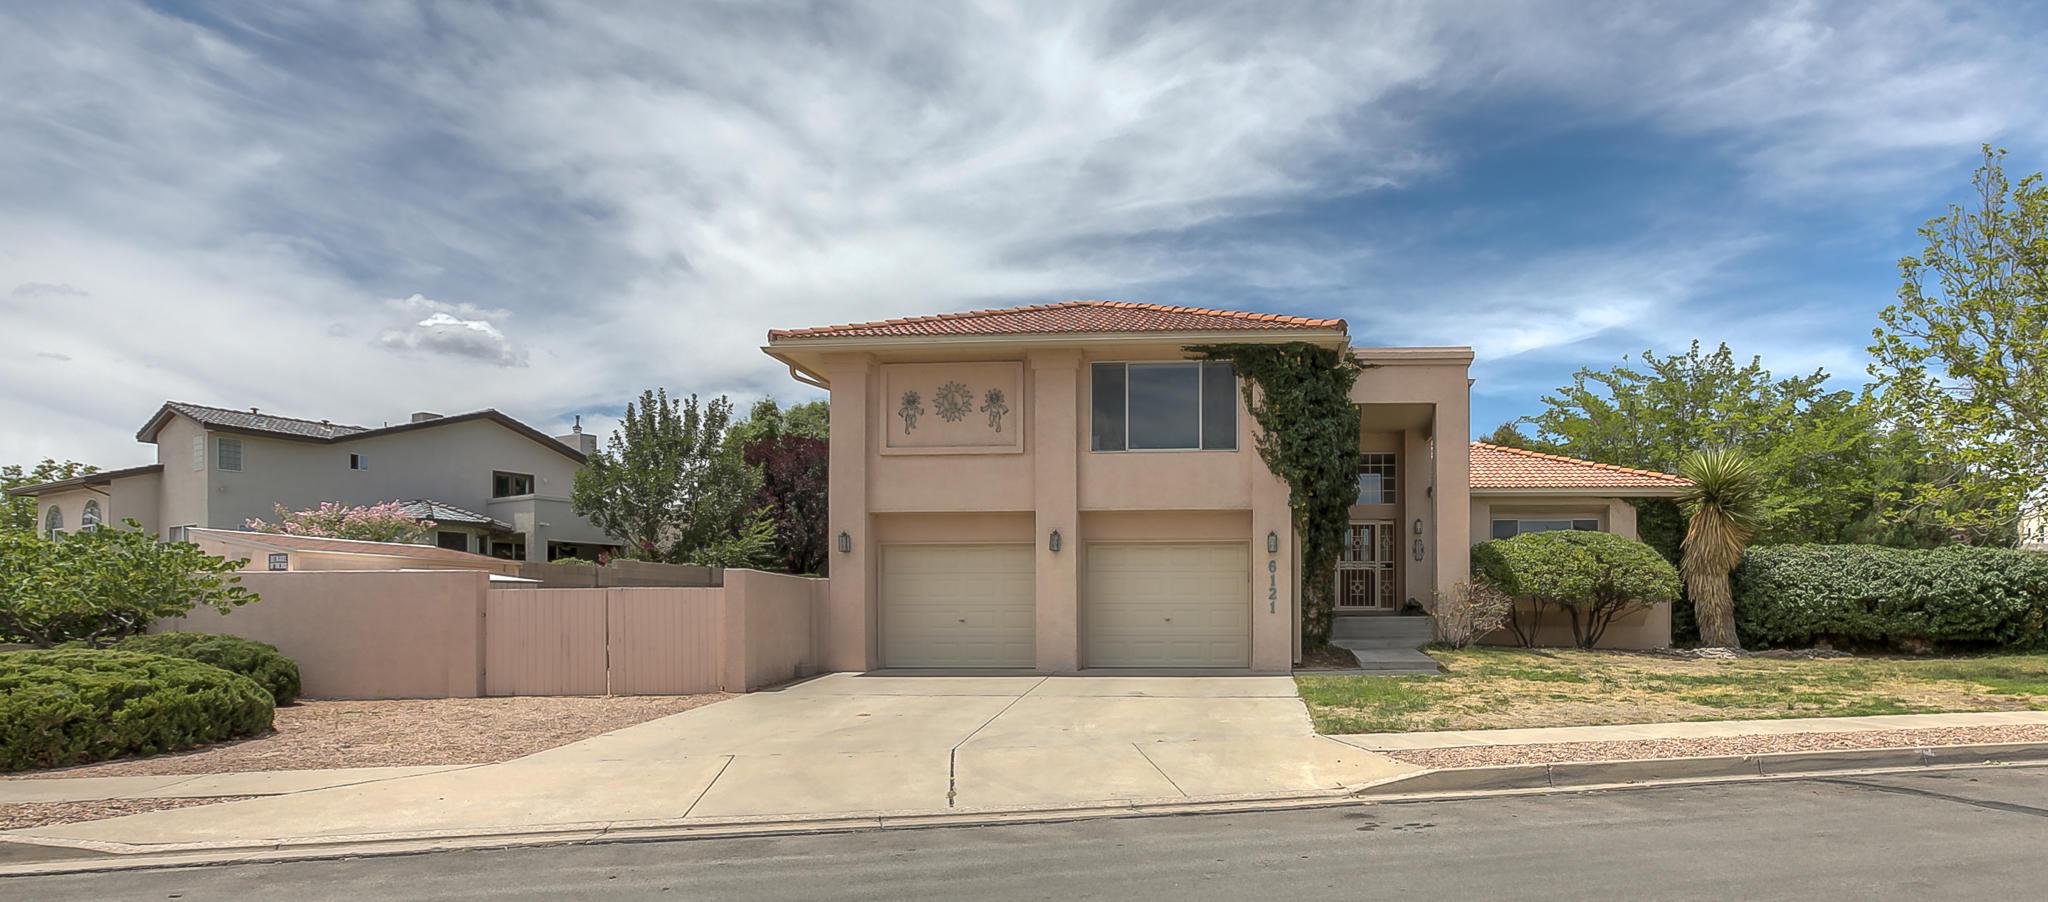 6121 NW Alderman Drive, Northwest Albuquerque and Northwest Heights, New Mexico